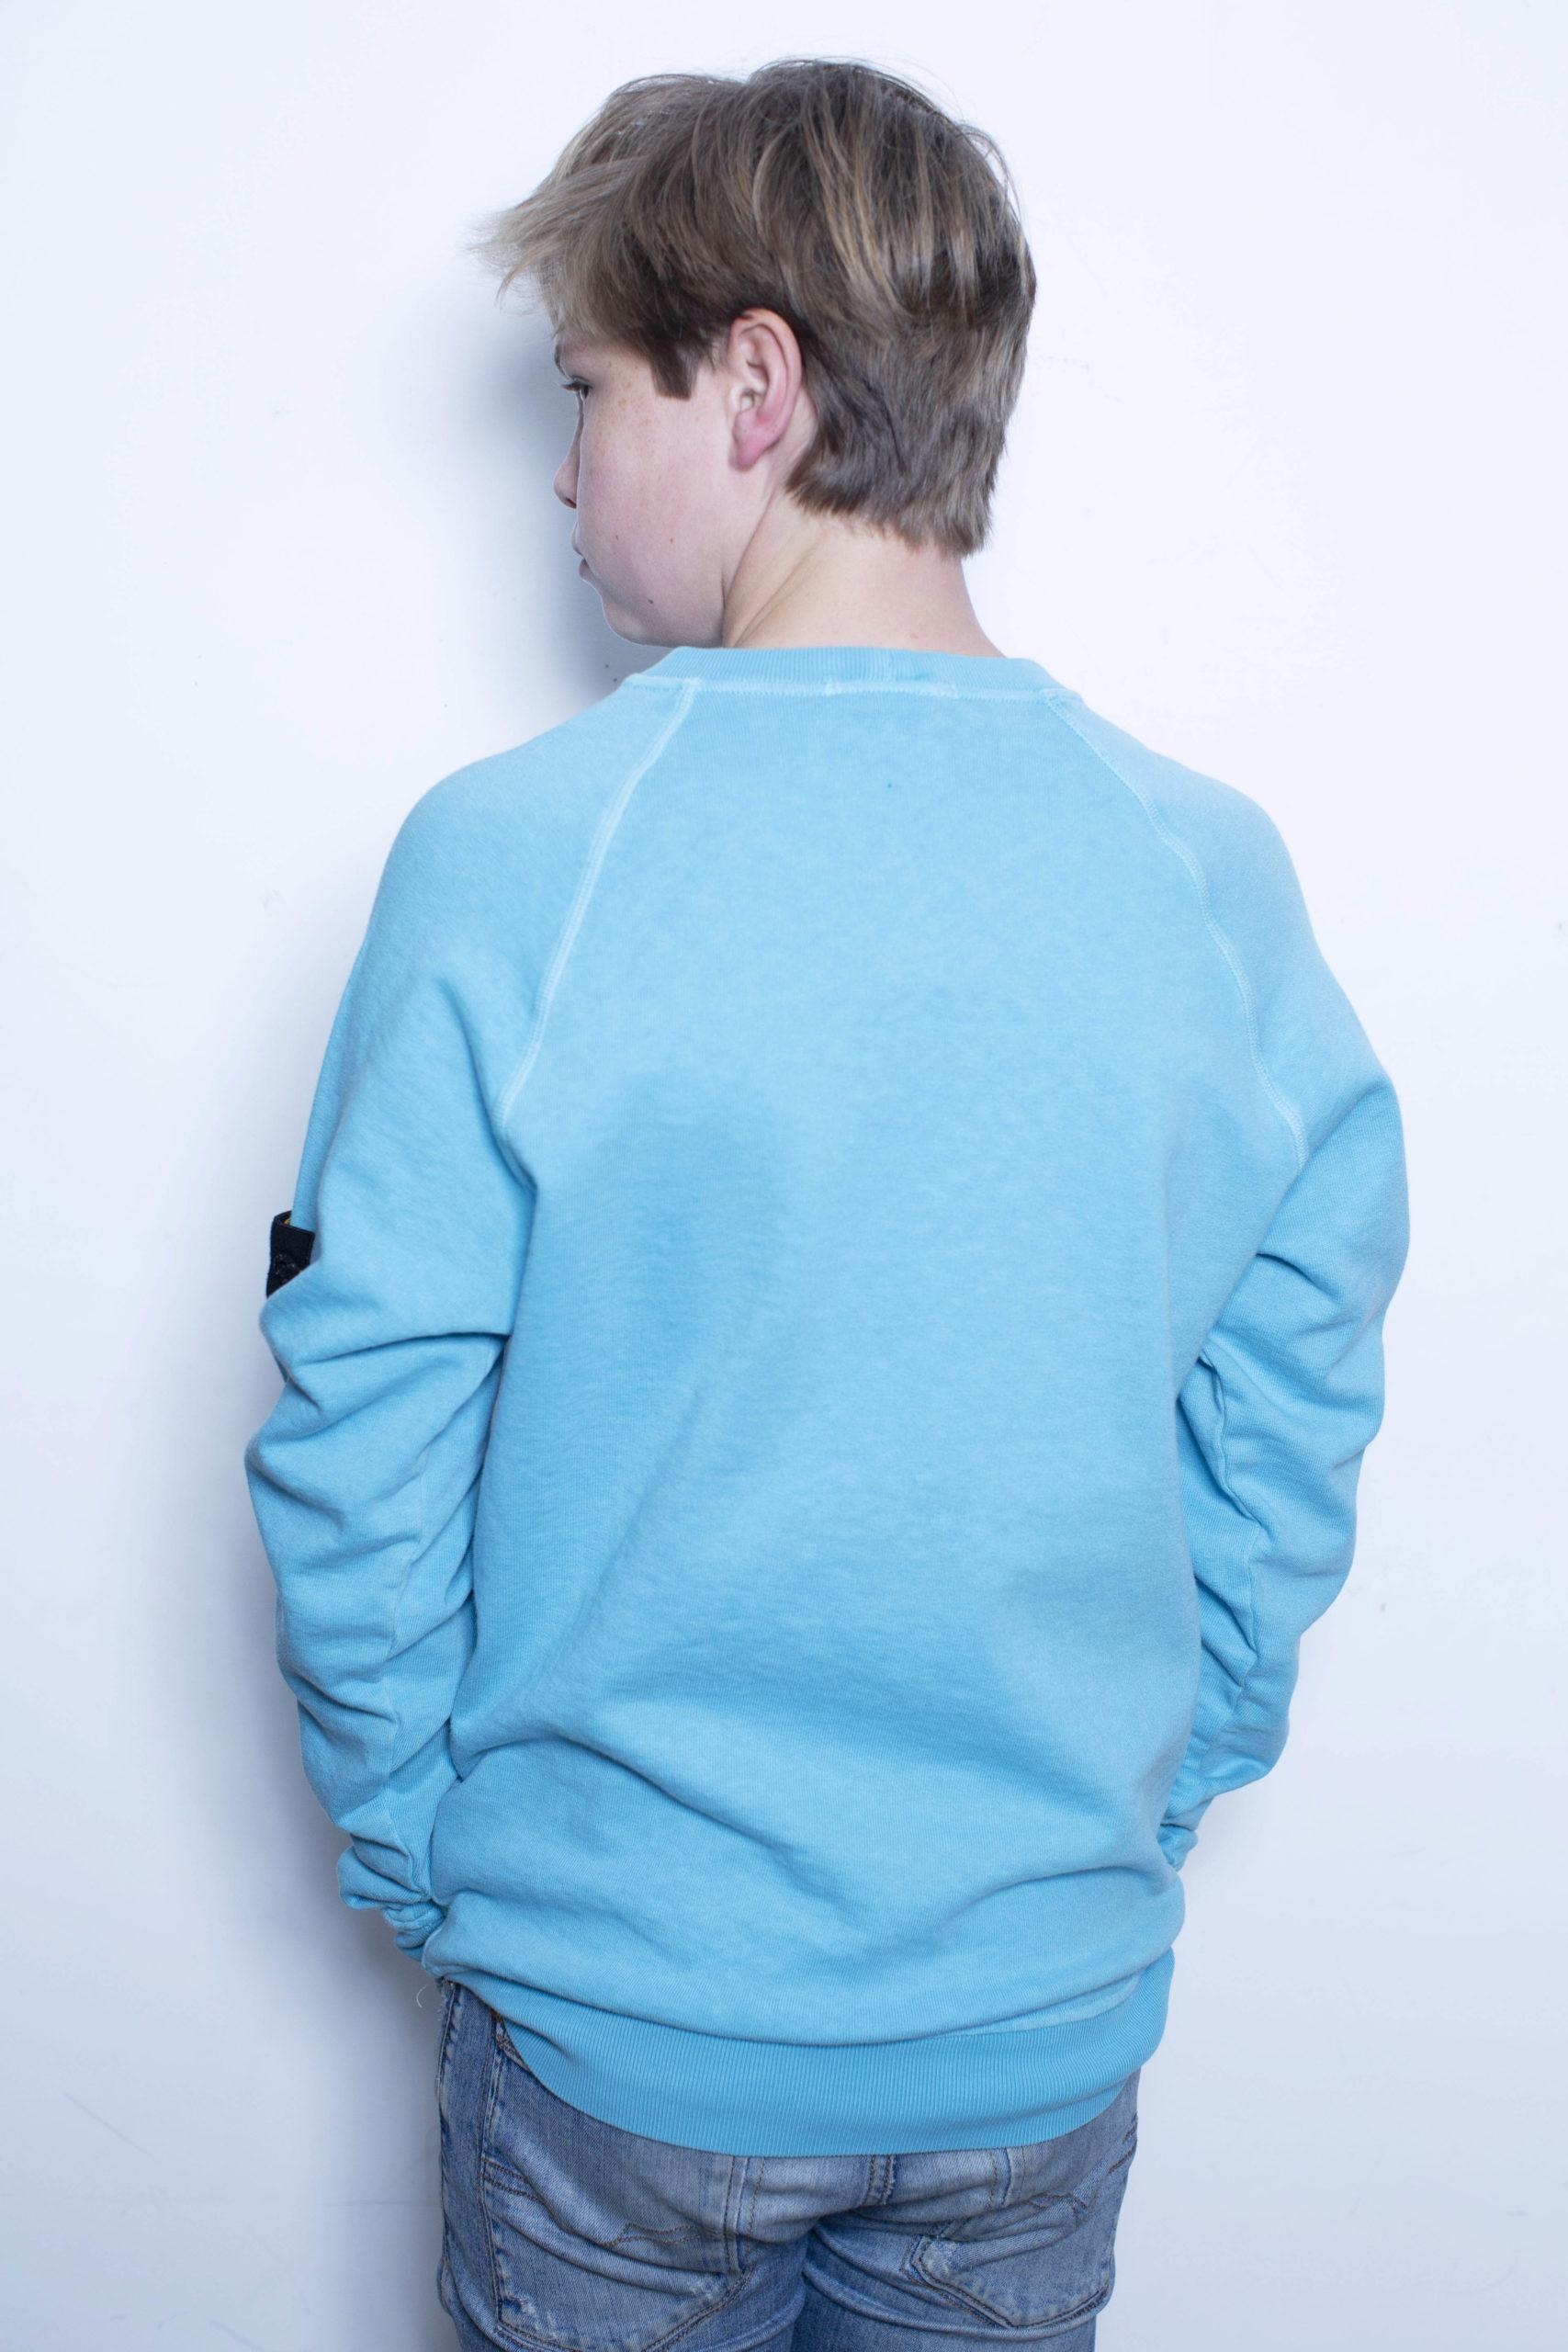 Stone Island Sweater Aqua